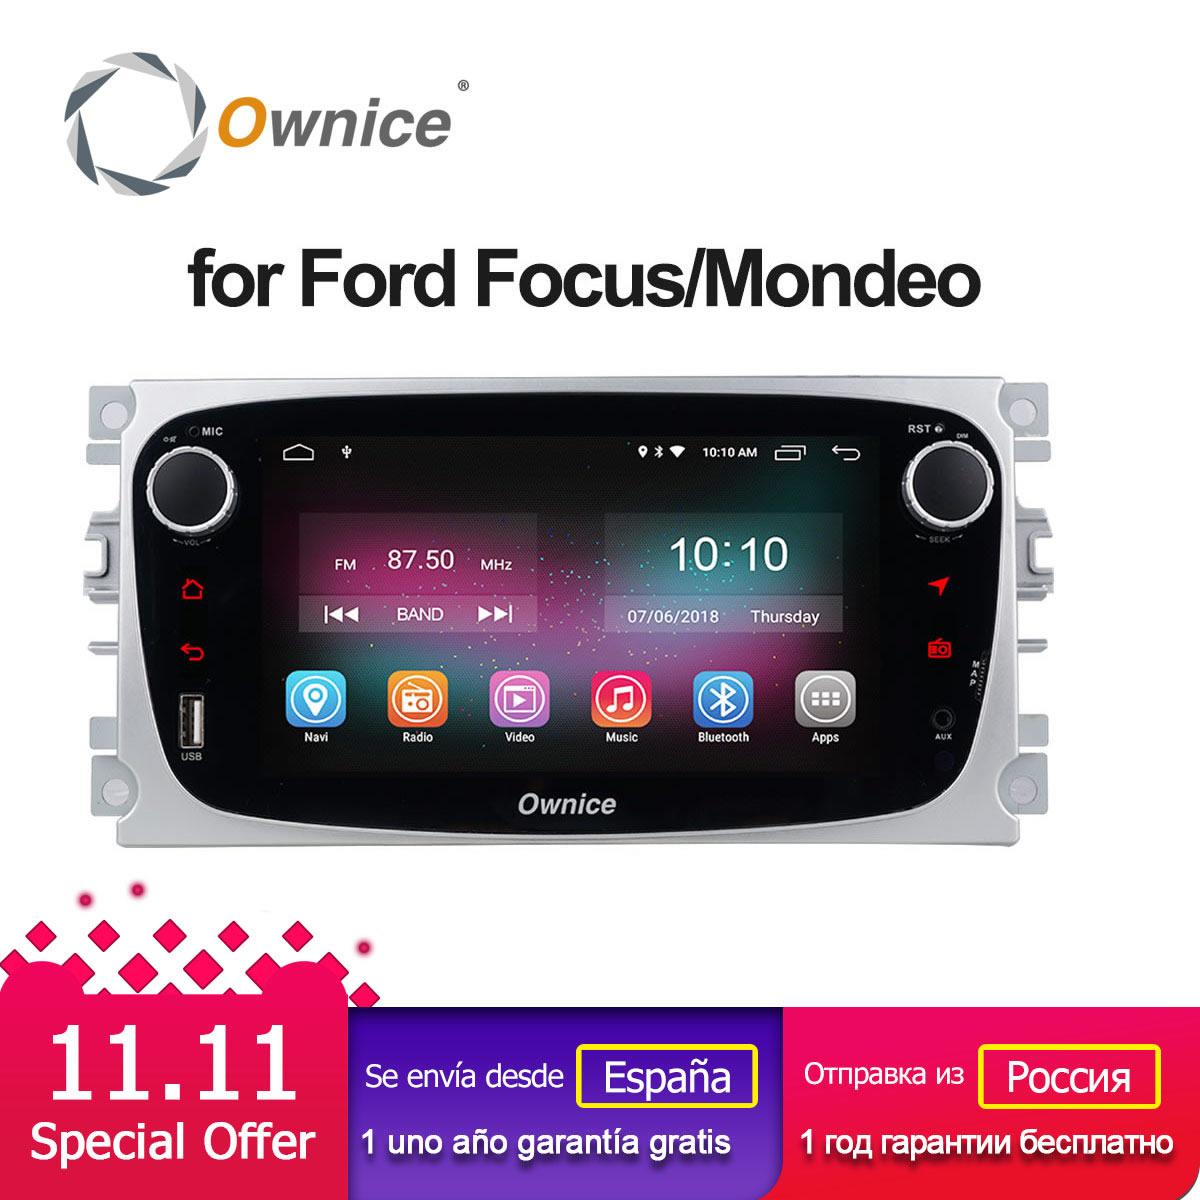 Ownice C500 G10 Android 6.0 Octa 8 Core Lecteur DVD de Voiture Pour FORD Mondeo S-MAX Connect POINT 2 2008- 2011 Avec Radio GPS 4g LTE